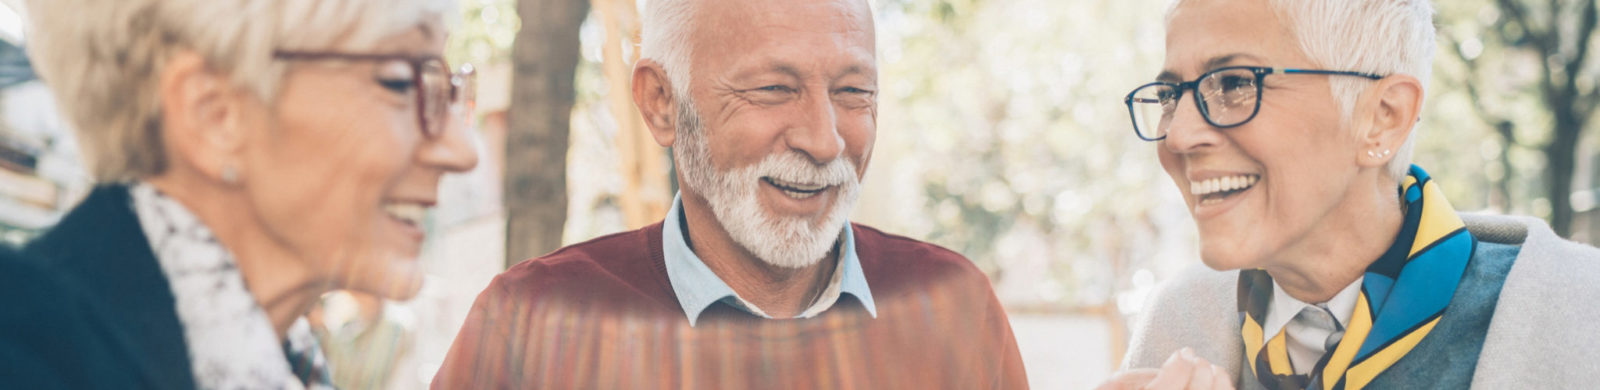 chrisitian retirement